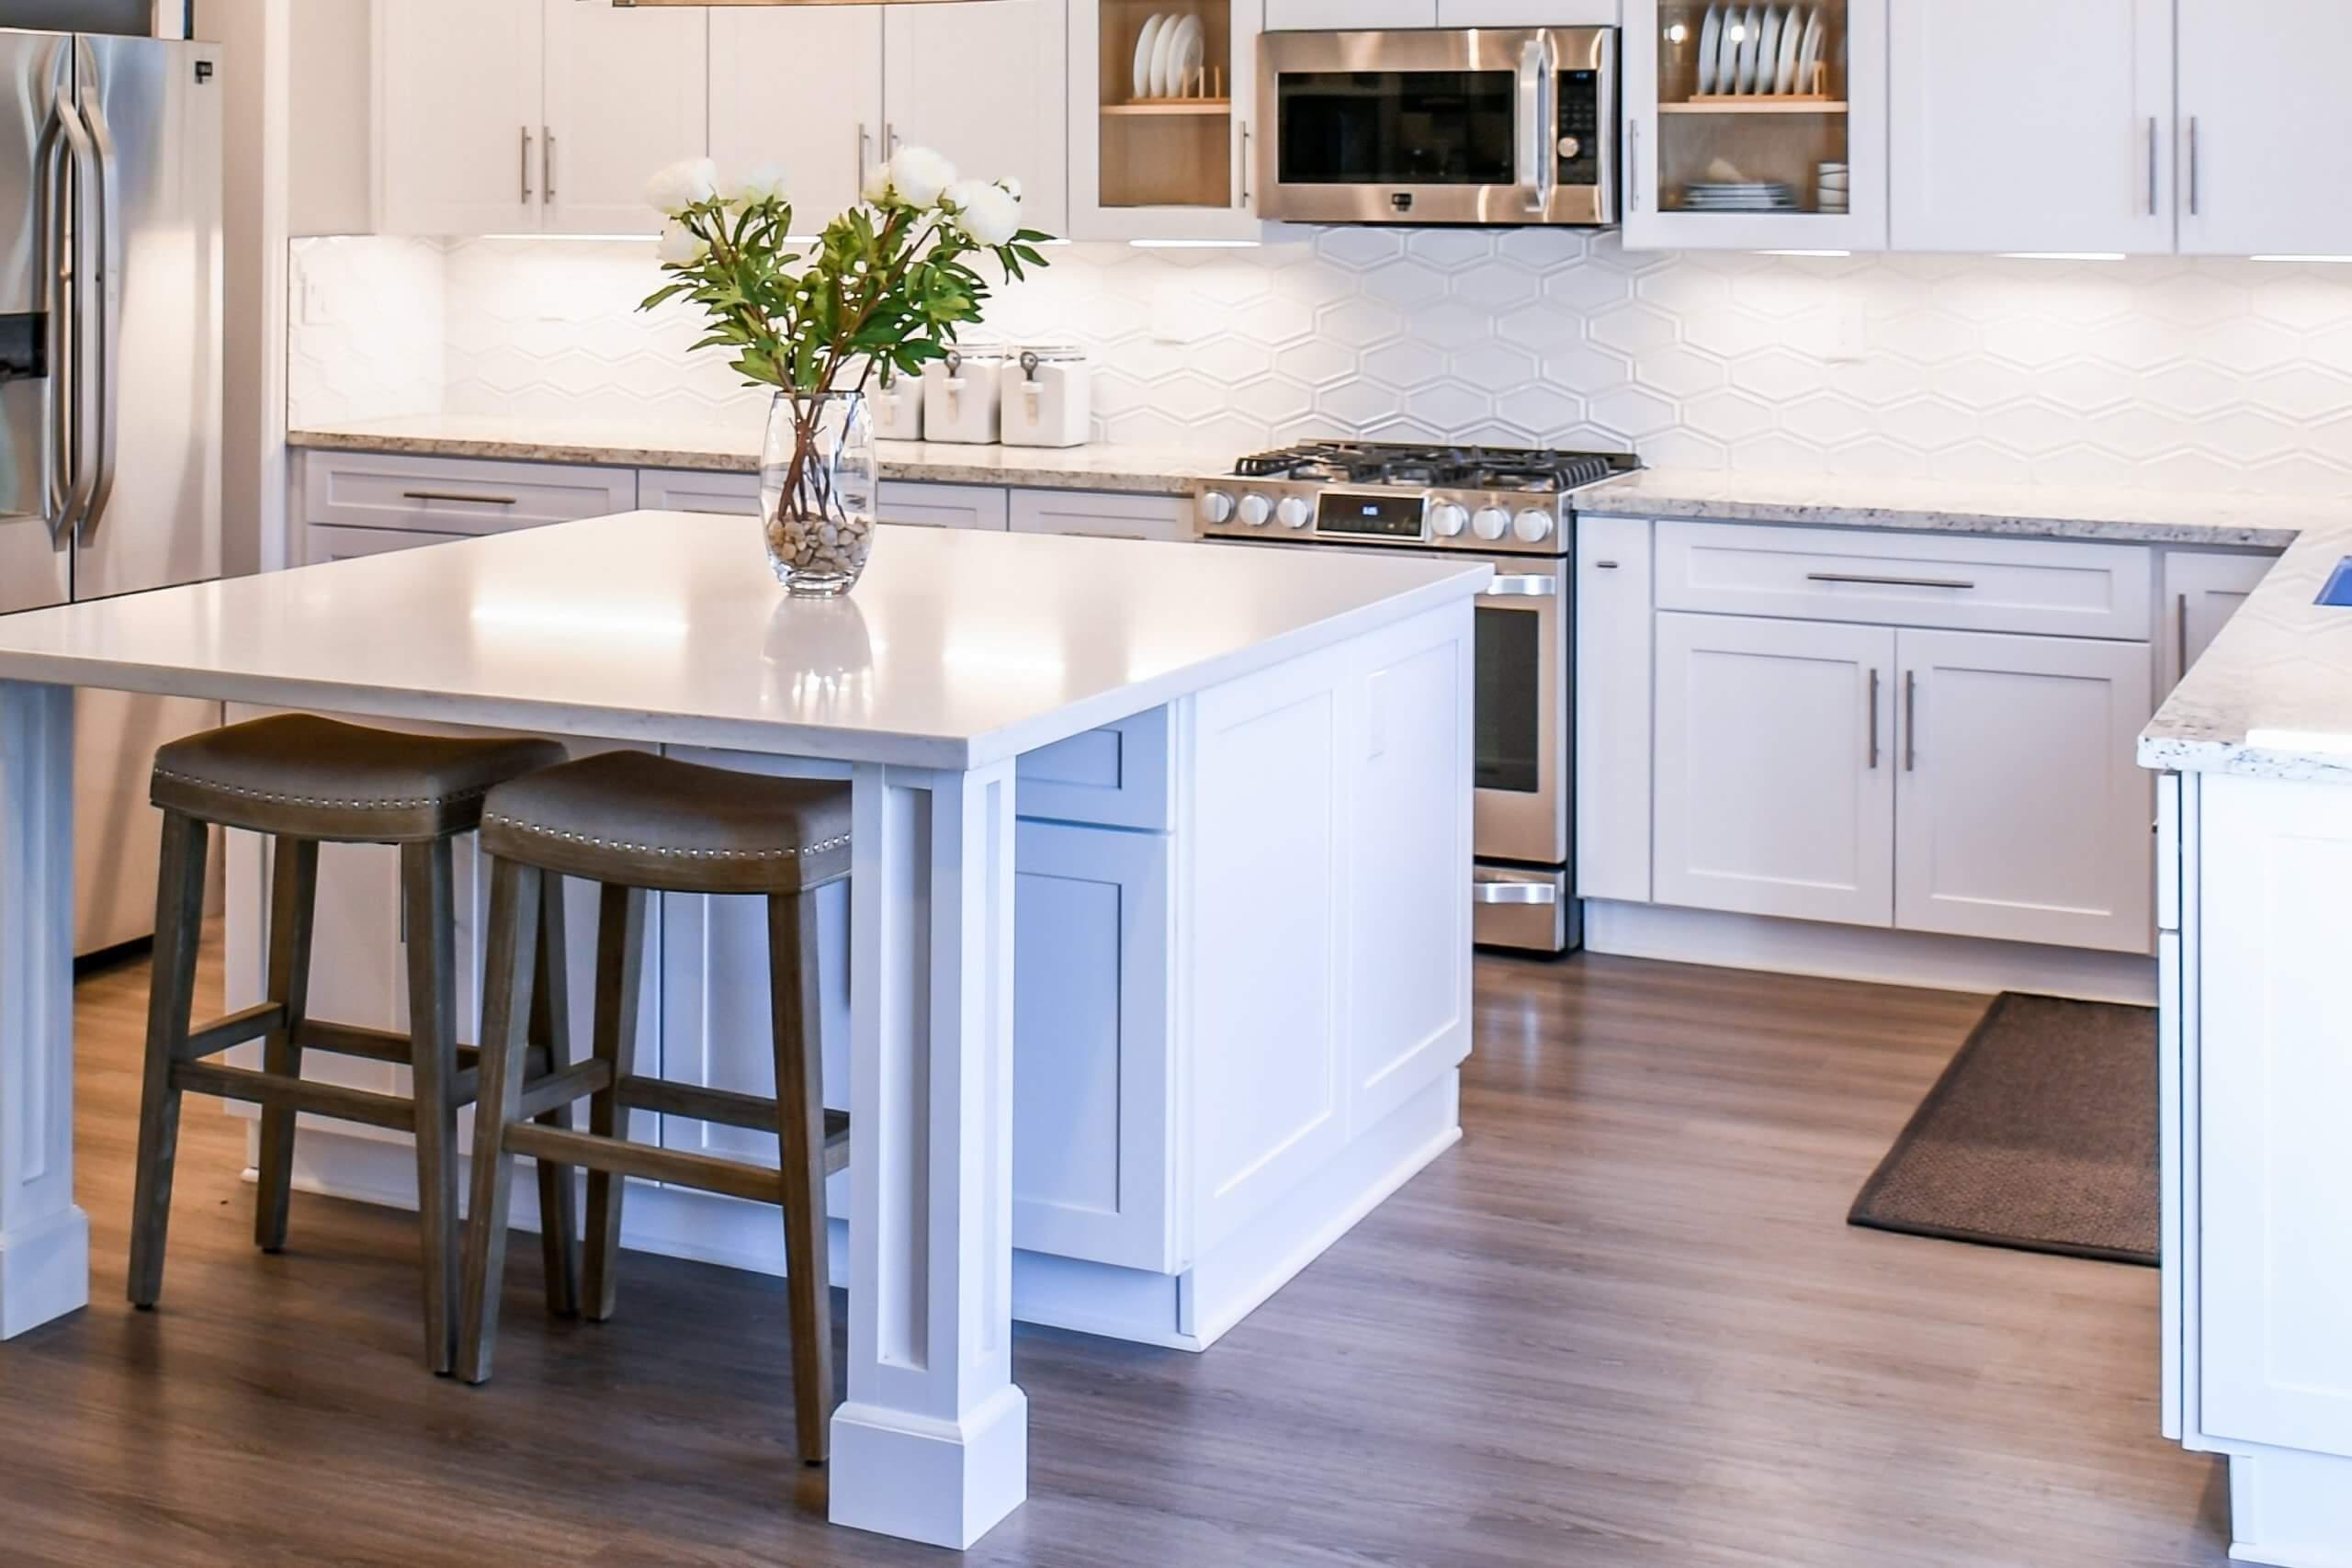 The Latest News About Flooring | Floor Installation